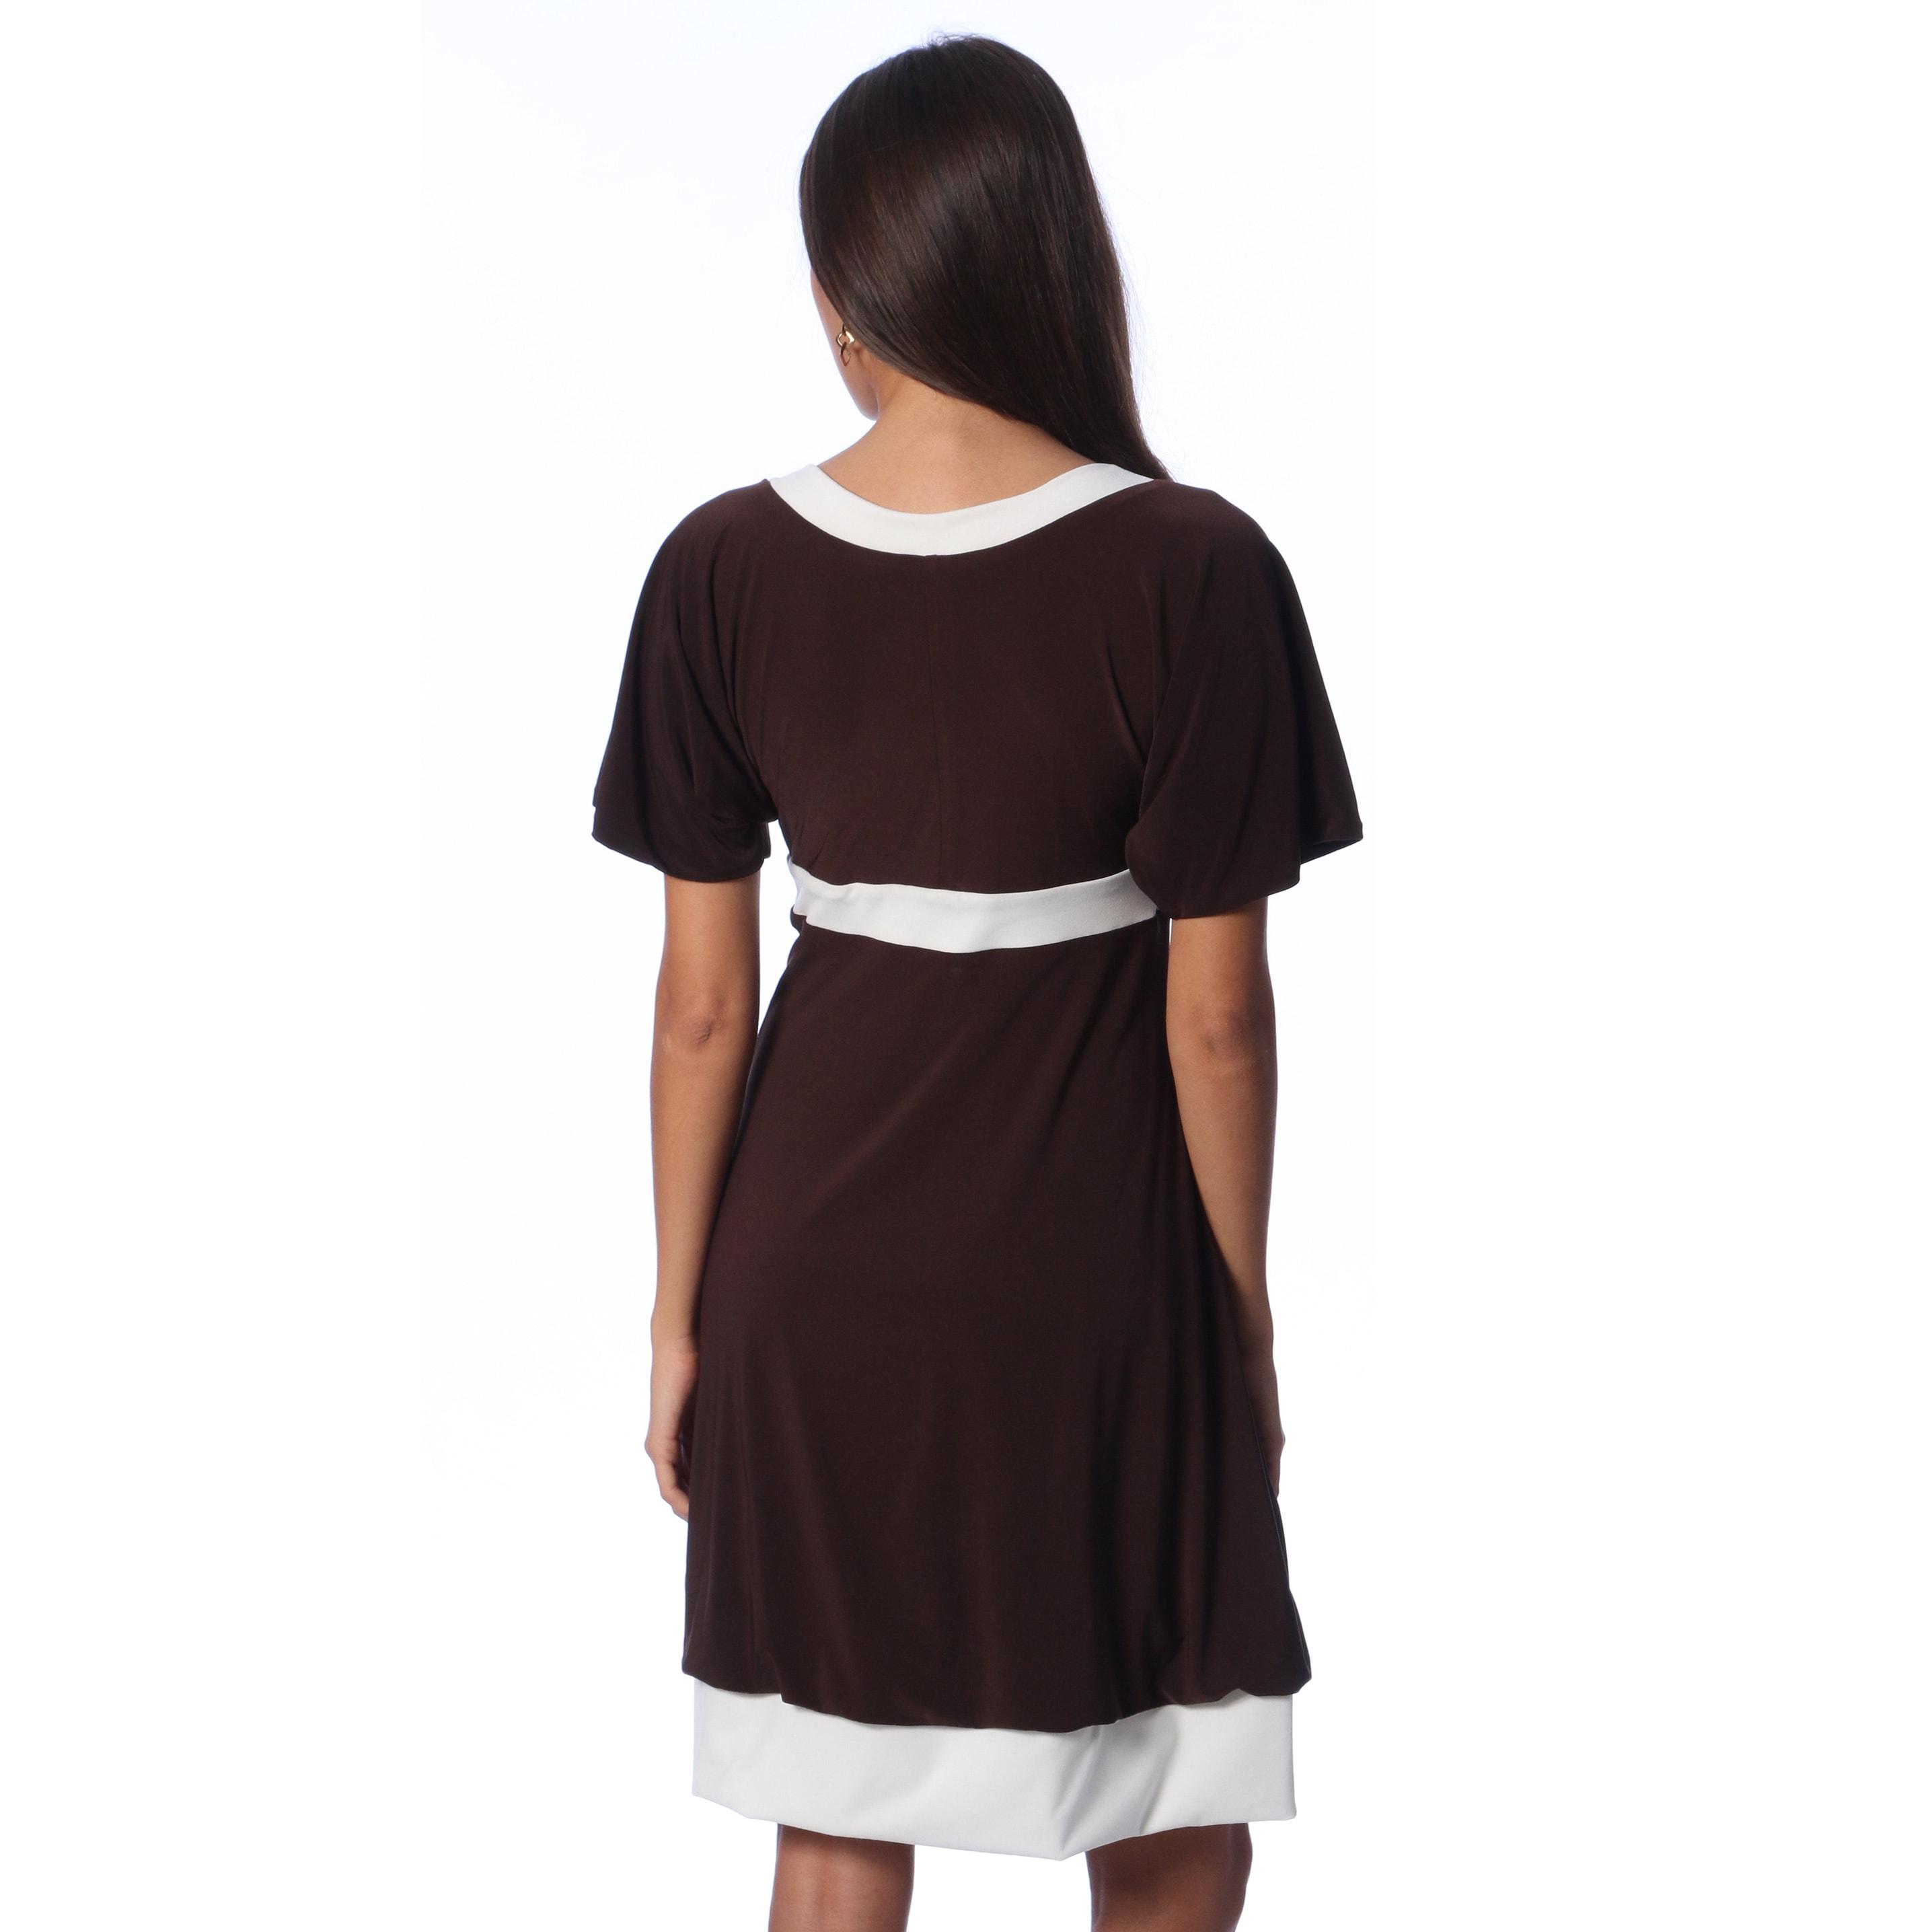 Handmade Elegant Doll Dress for  FR Kurhn Doll Party Dress Clothes Te